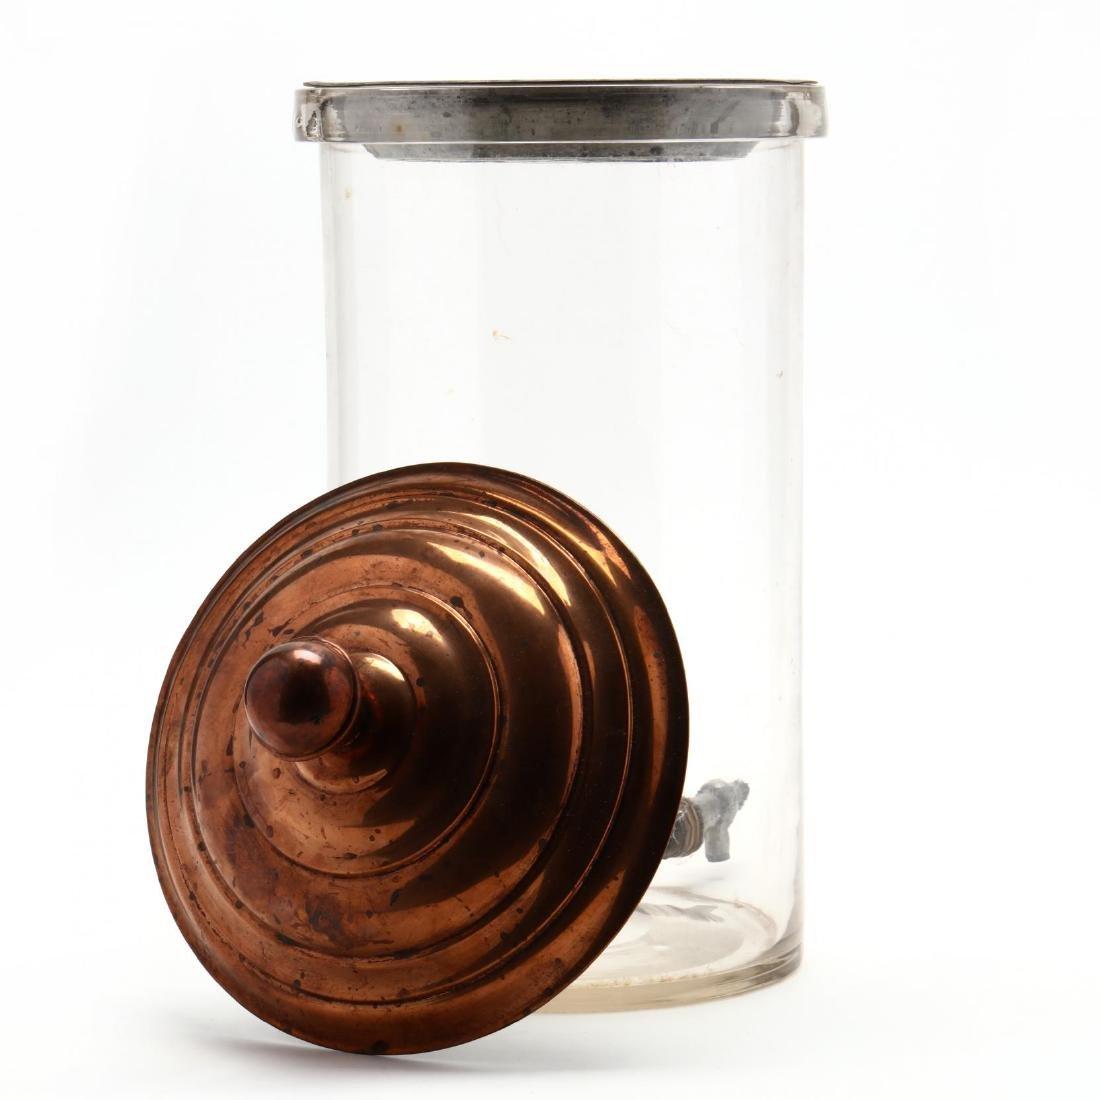 Antique Lidded Apothecary Dispenser - 2